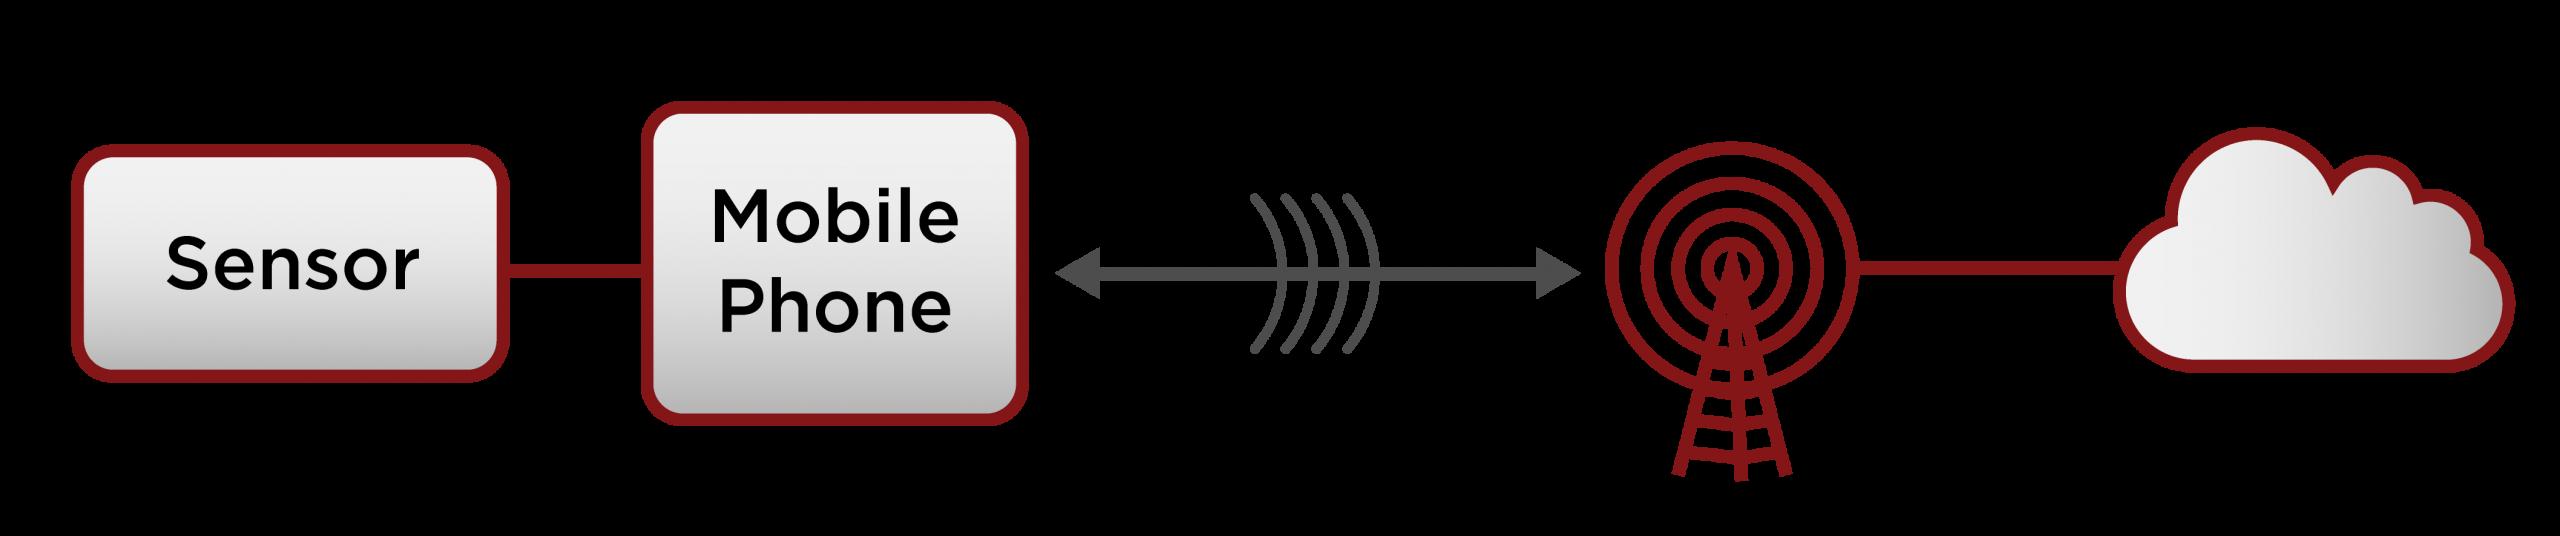 sensor phone cloud image